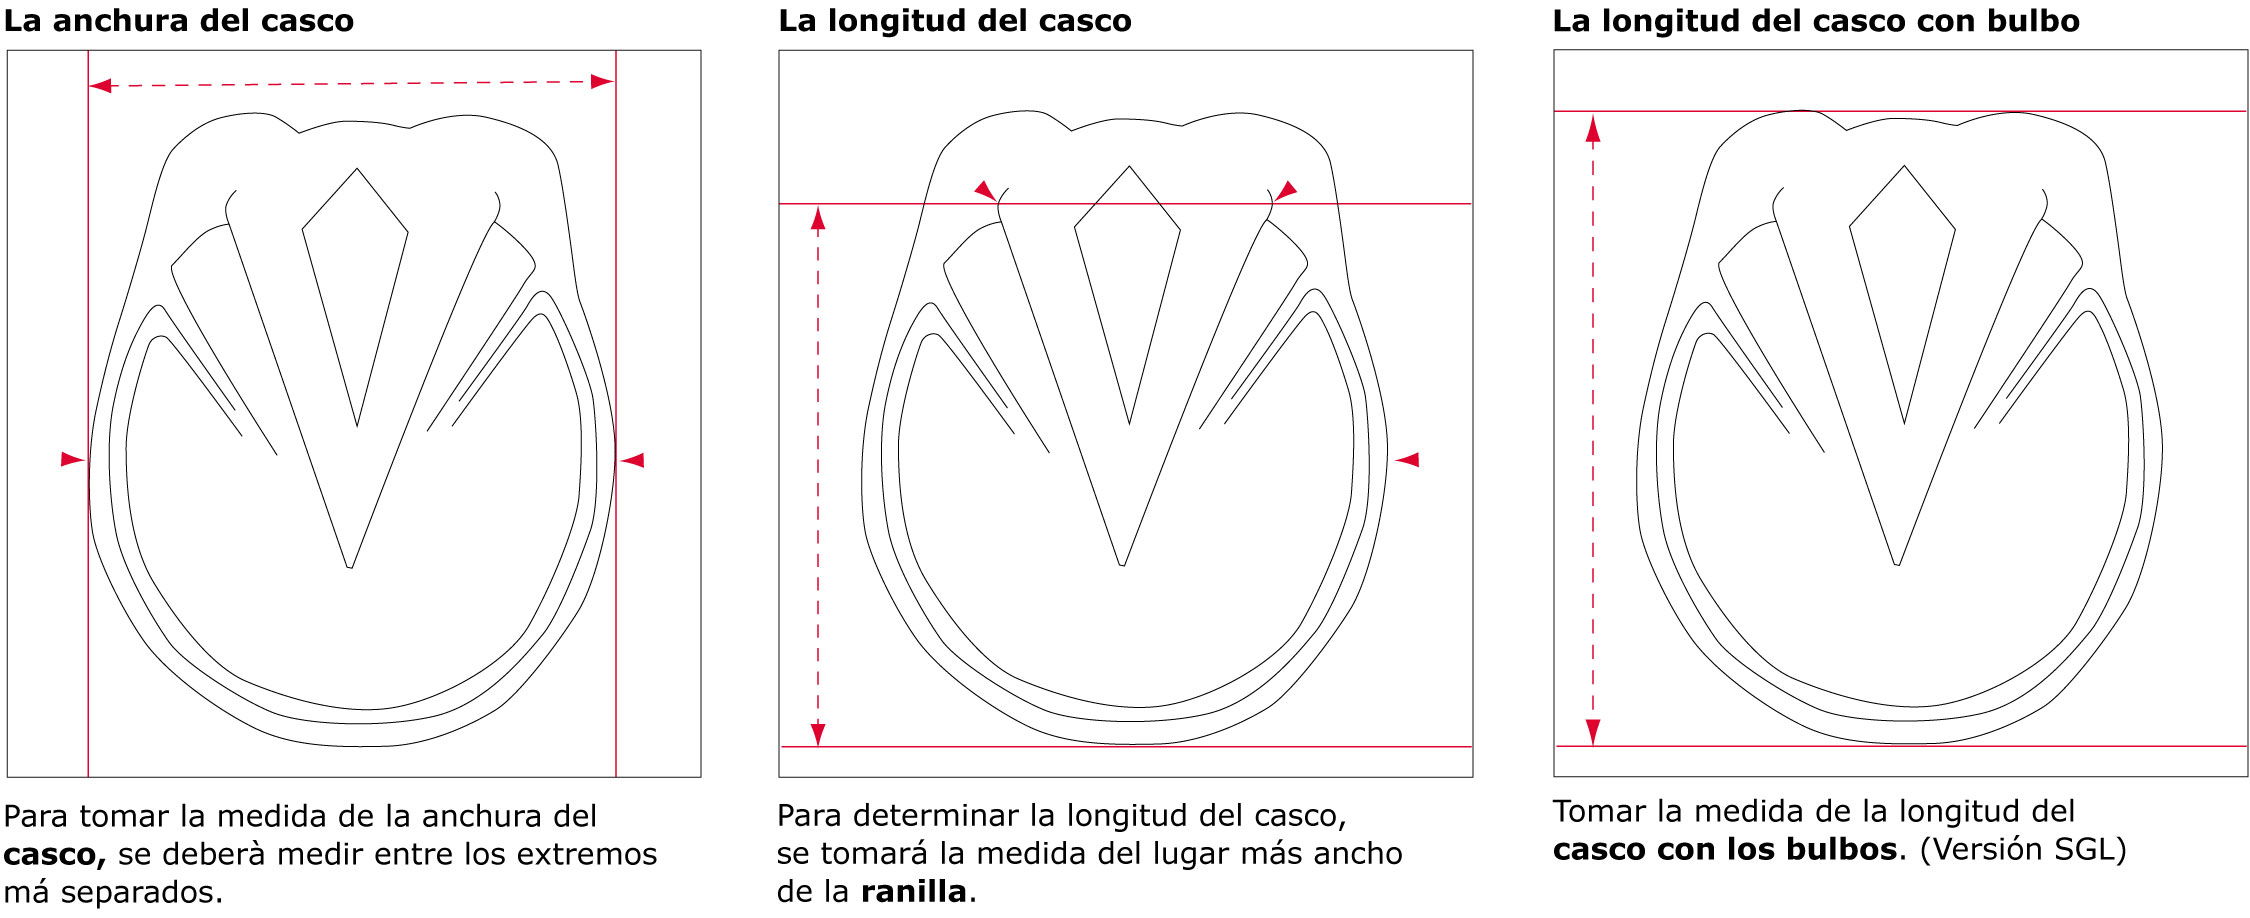 tabelle-swiss-largo.es.jpg